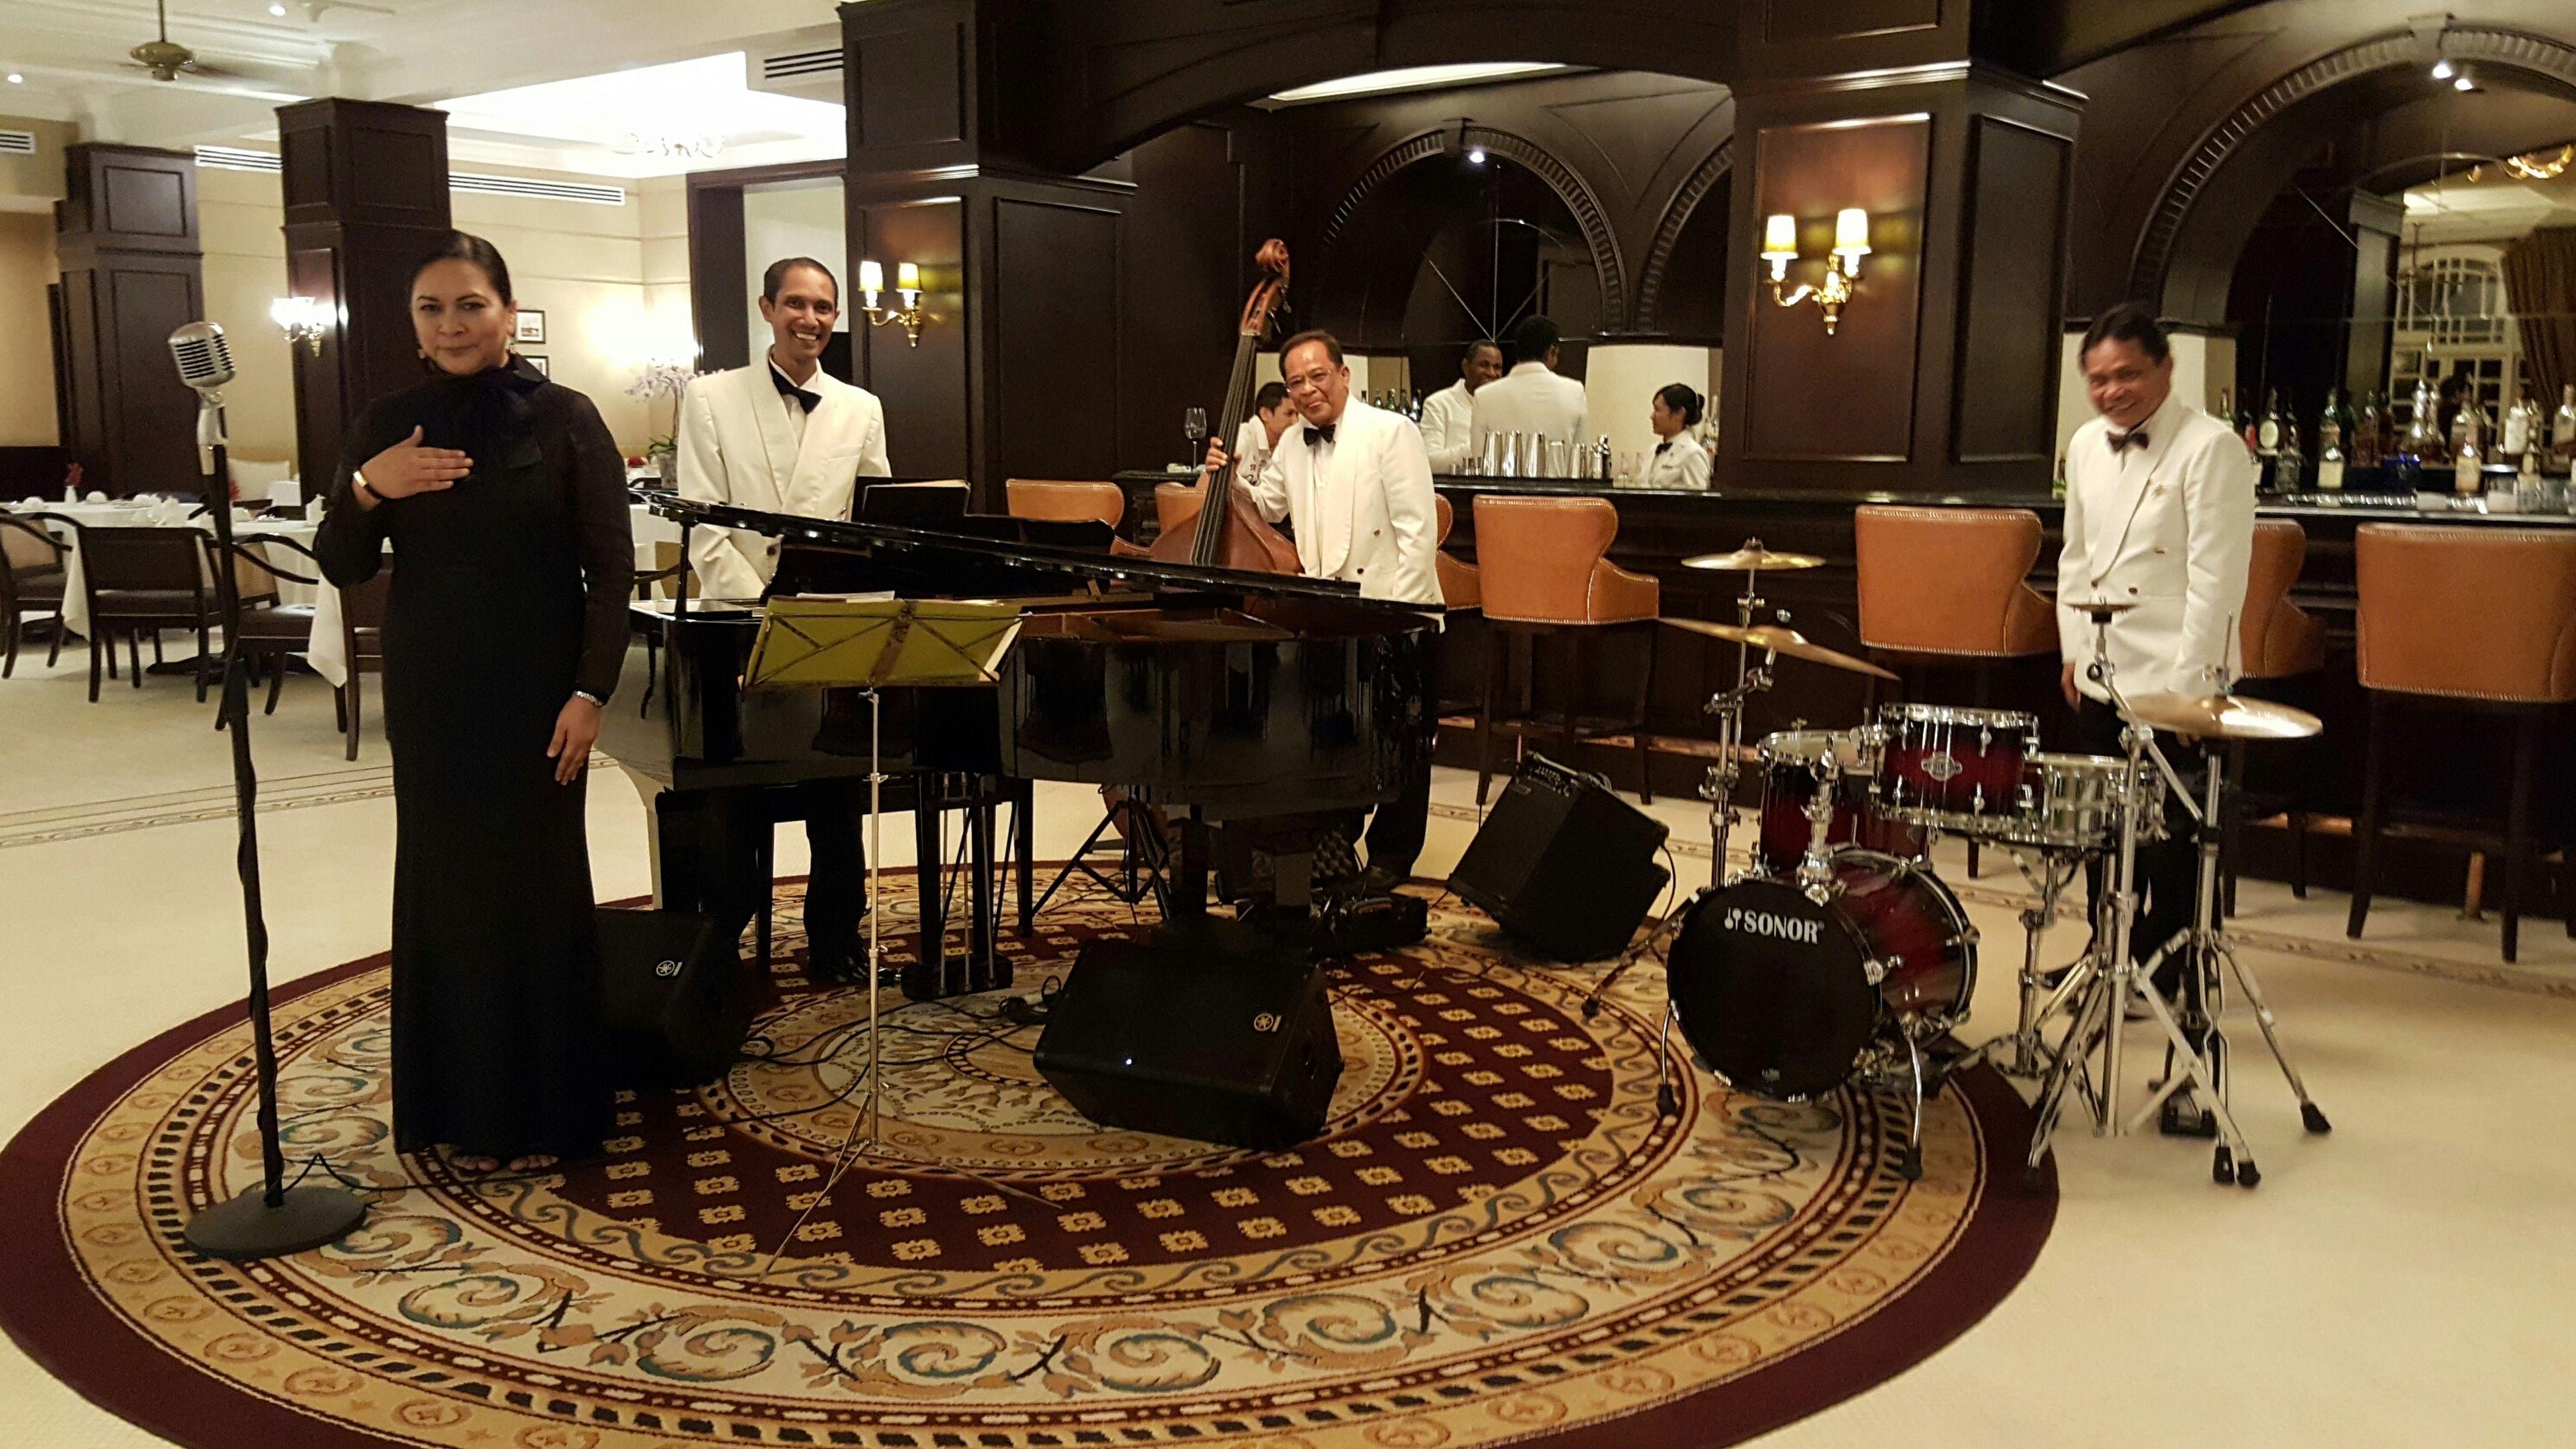 The Quartet Majestic Hotel KL Colonial Cafe Colonial Style Kuala Lumpur Malaysia  Travel Destinations Malaysia Truly Asia International Landmark Kuala Lumpur Malaysia  Kuala Lumpur I Love Kuala Lumpur Monument Bar - Drink Establishment